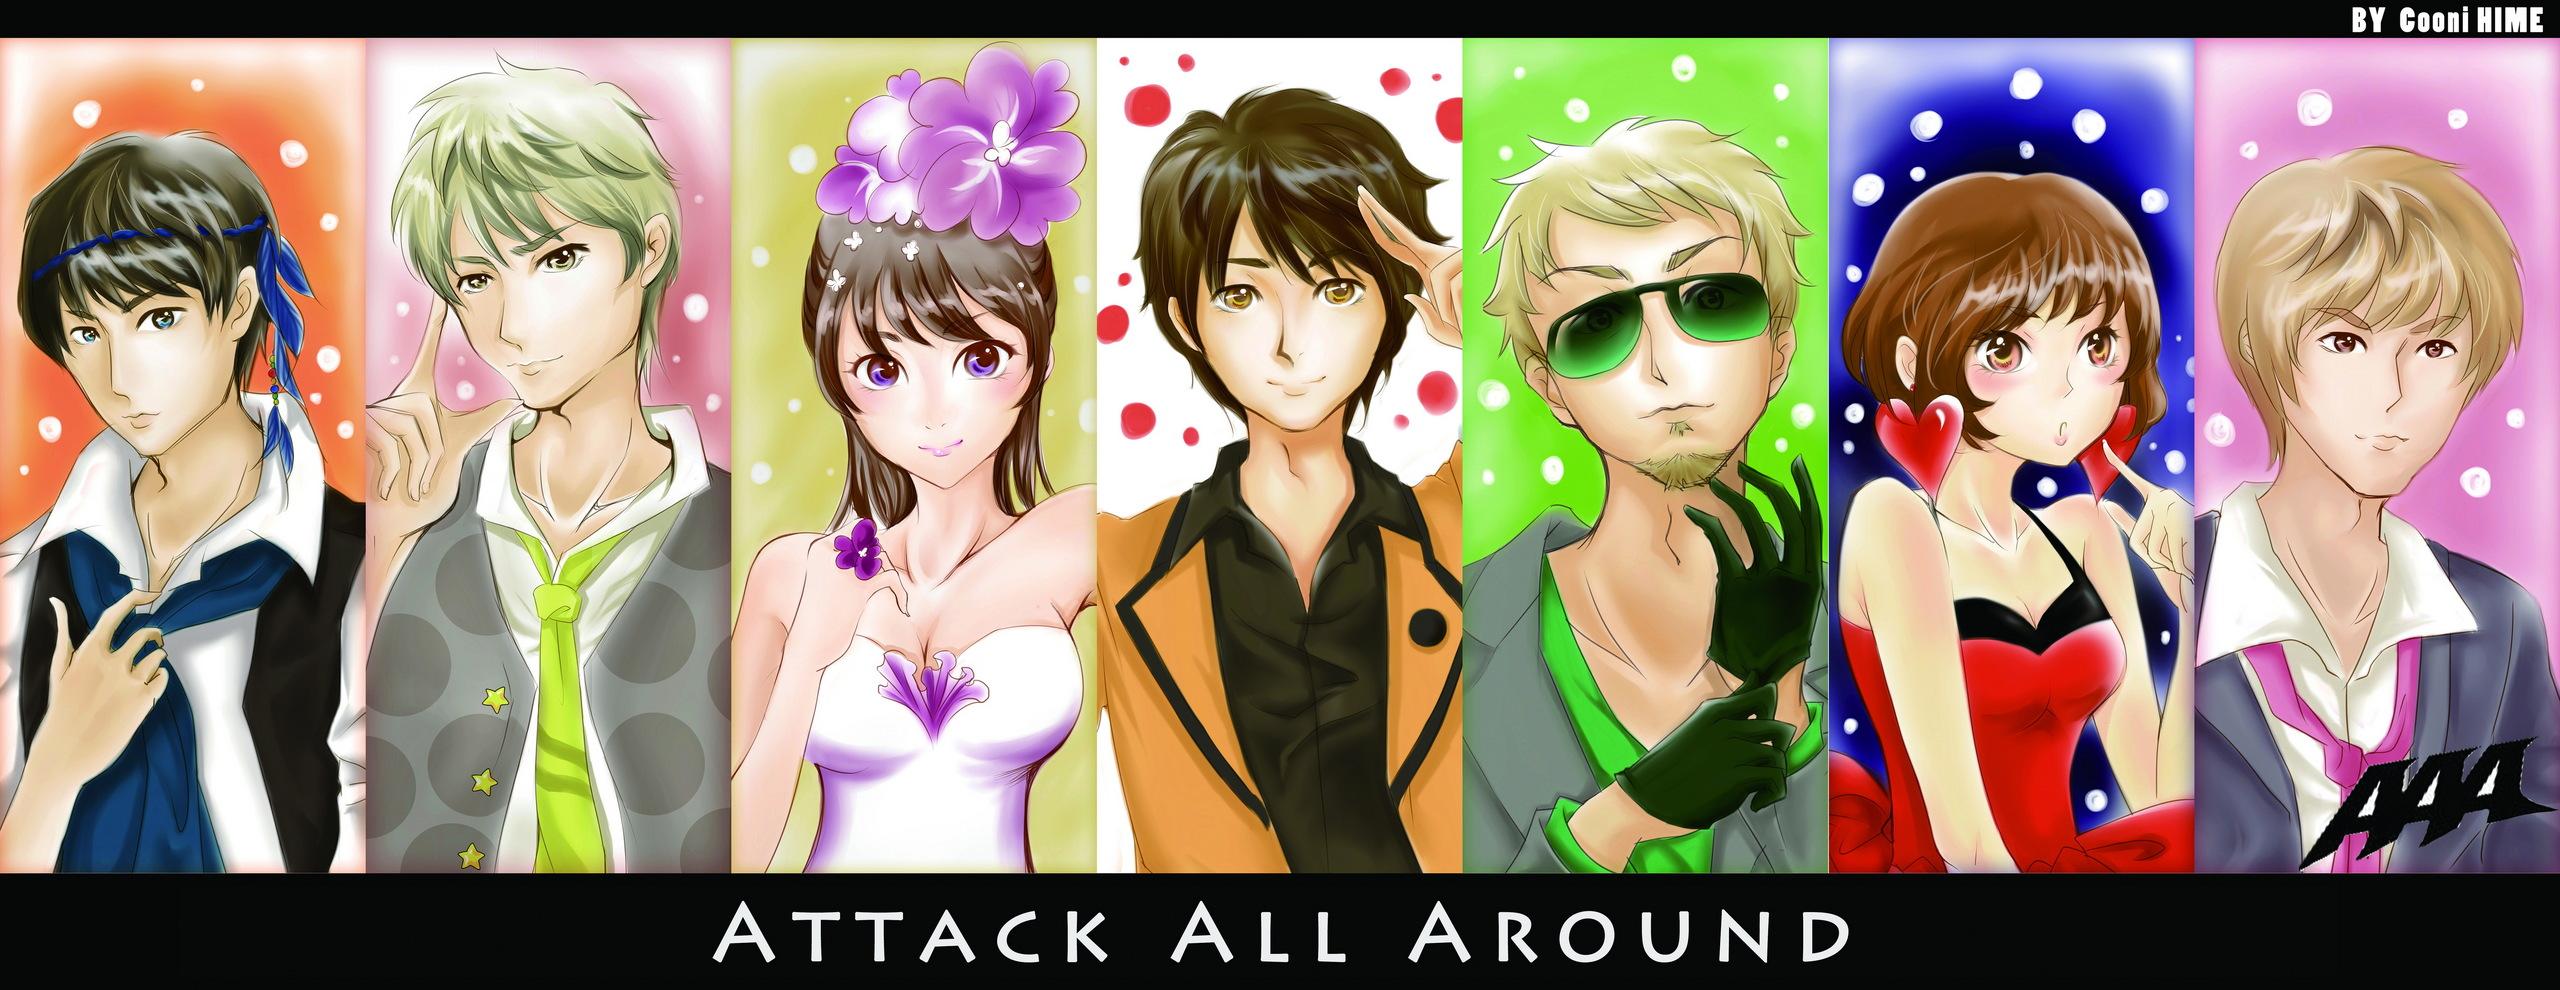 Summer of aaa attack all around fan art 30379836 fanpop